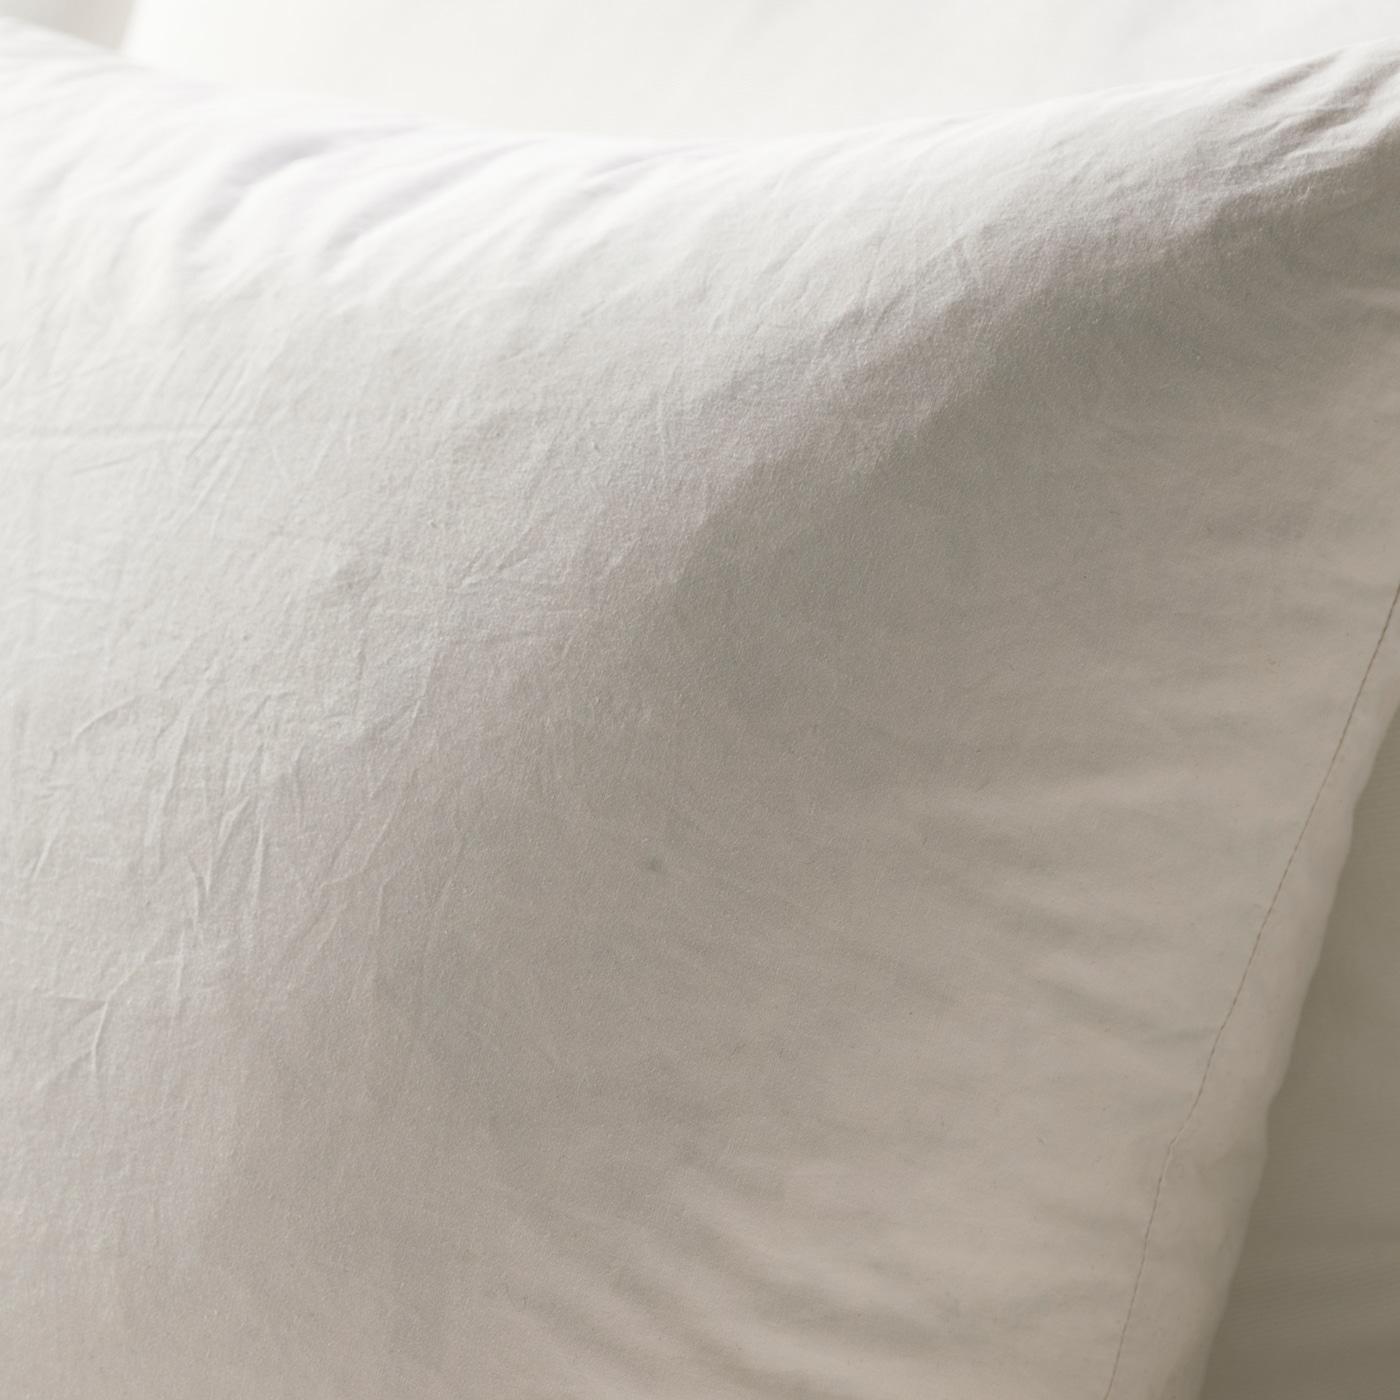 Fjadrar Interno Per Cuscino Bianco Sporco 50x50 Cm Ikea Svizzera